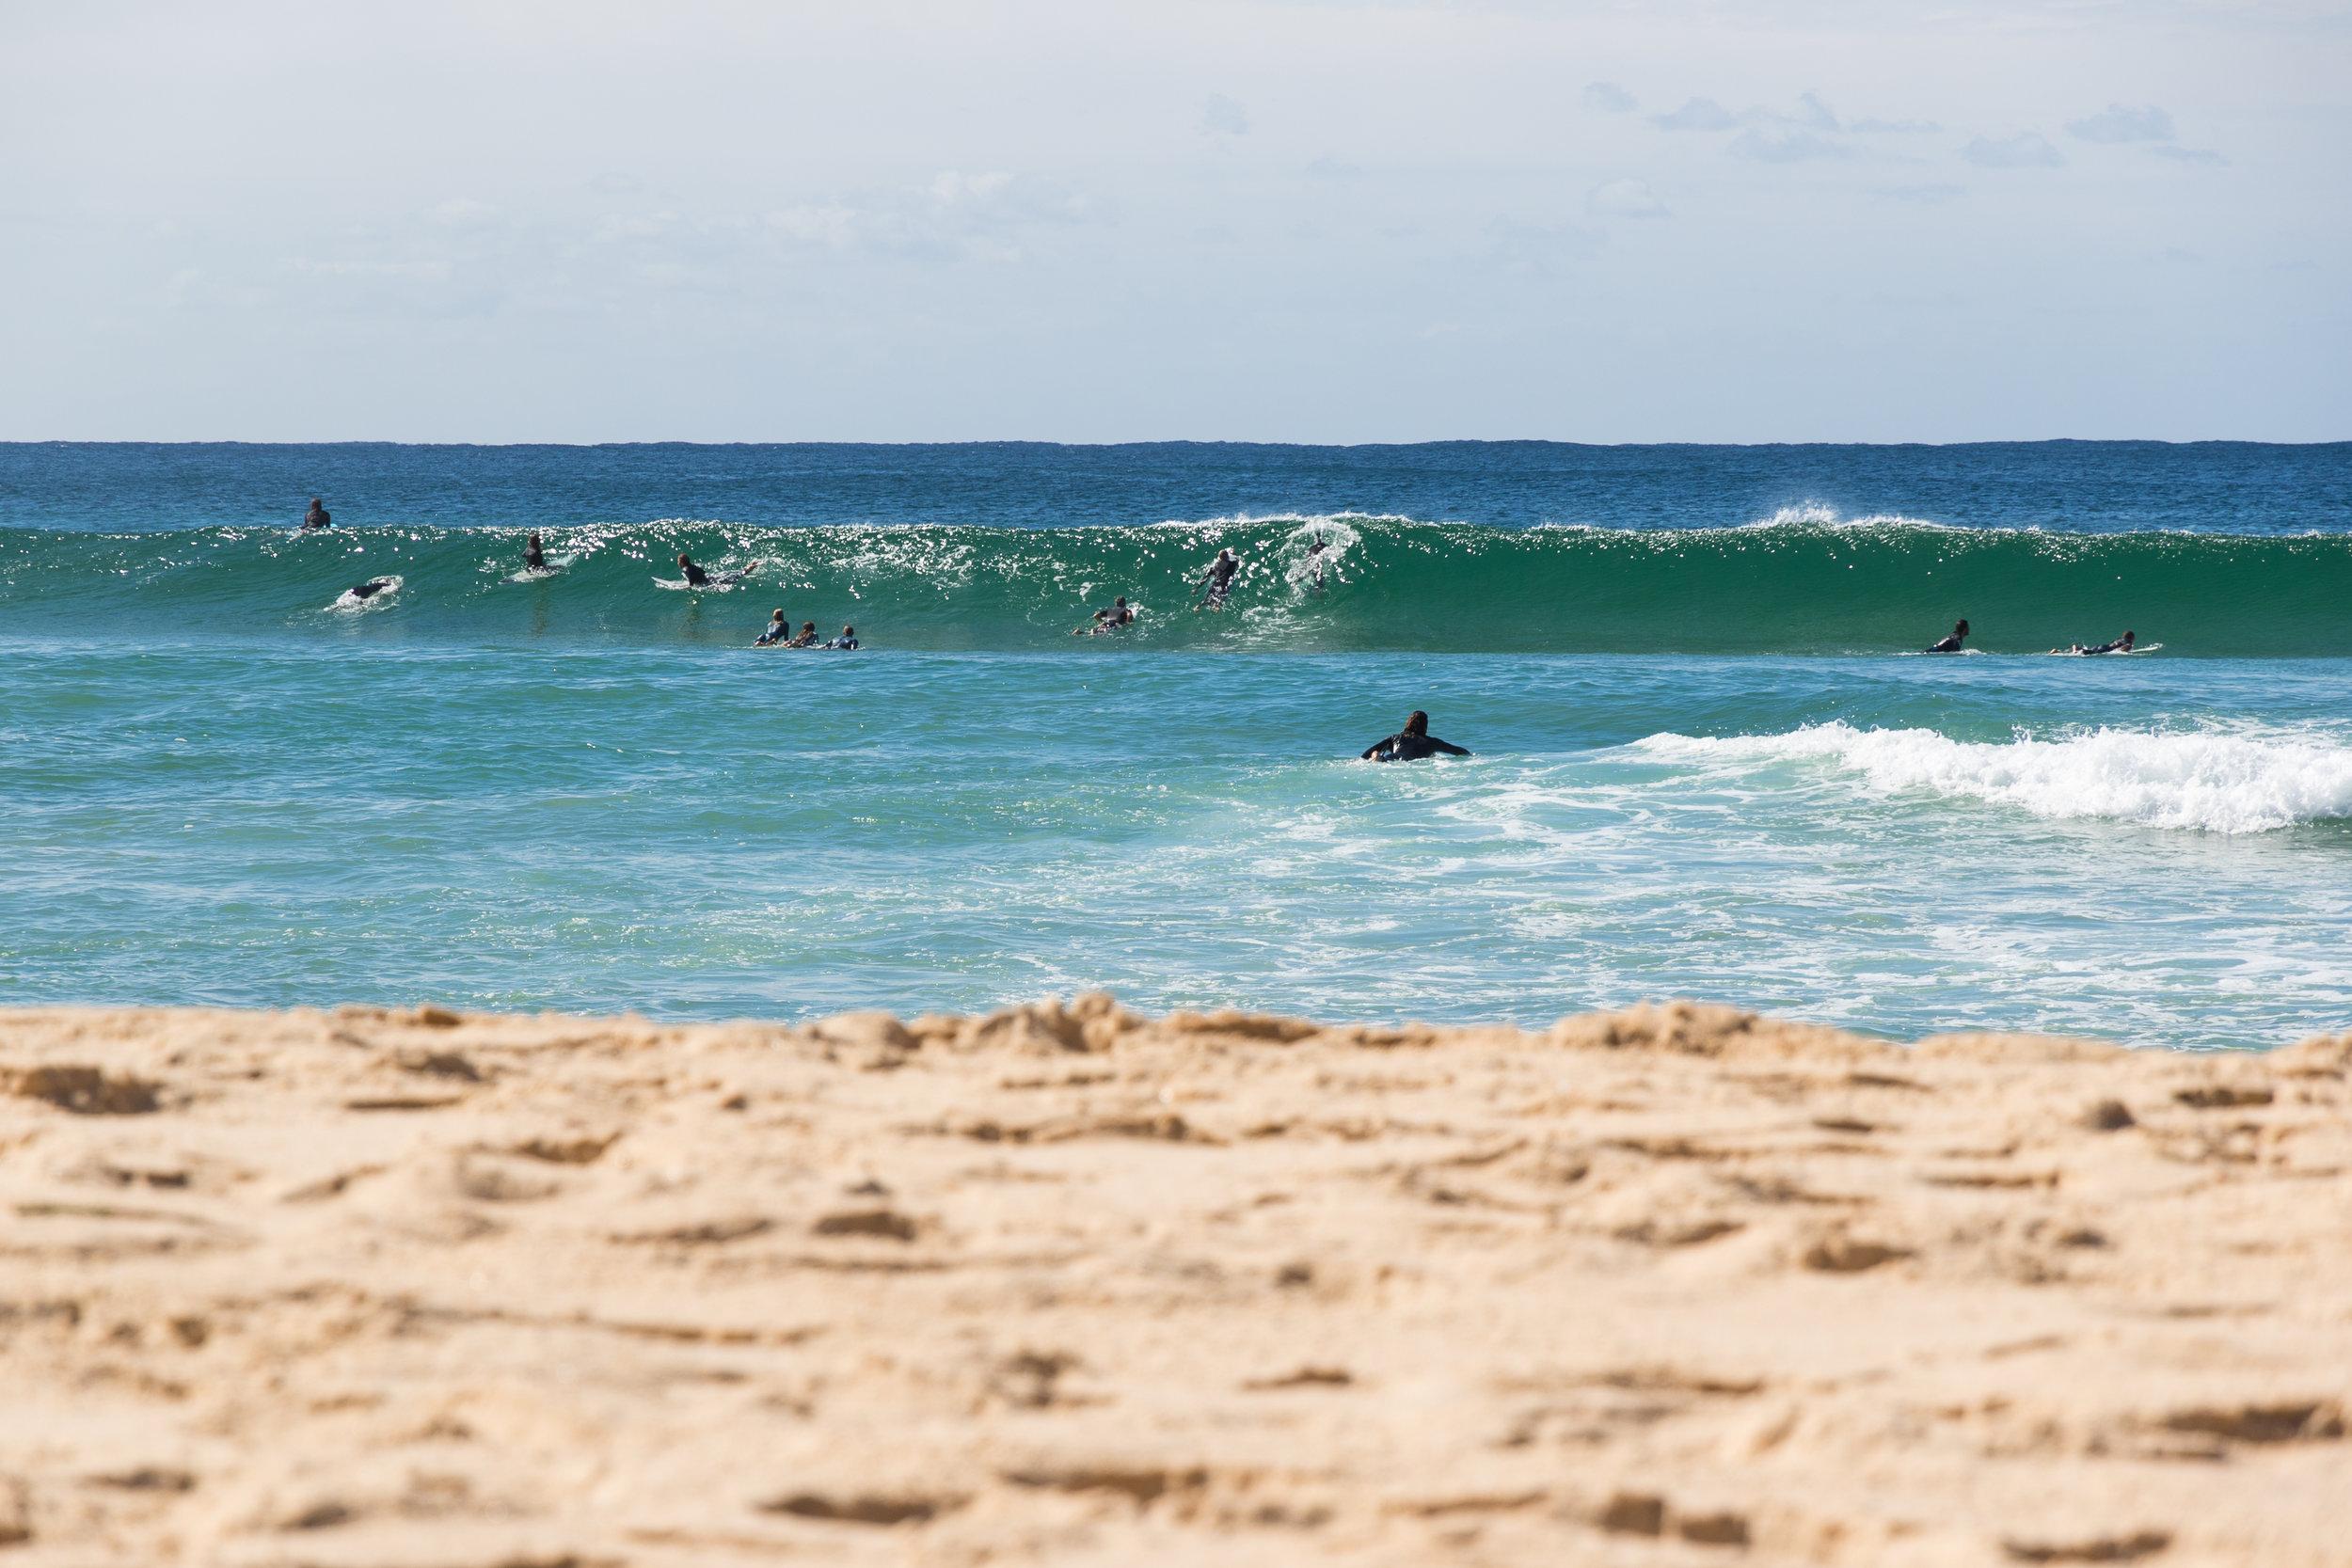 surf lesson in progress